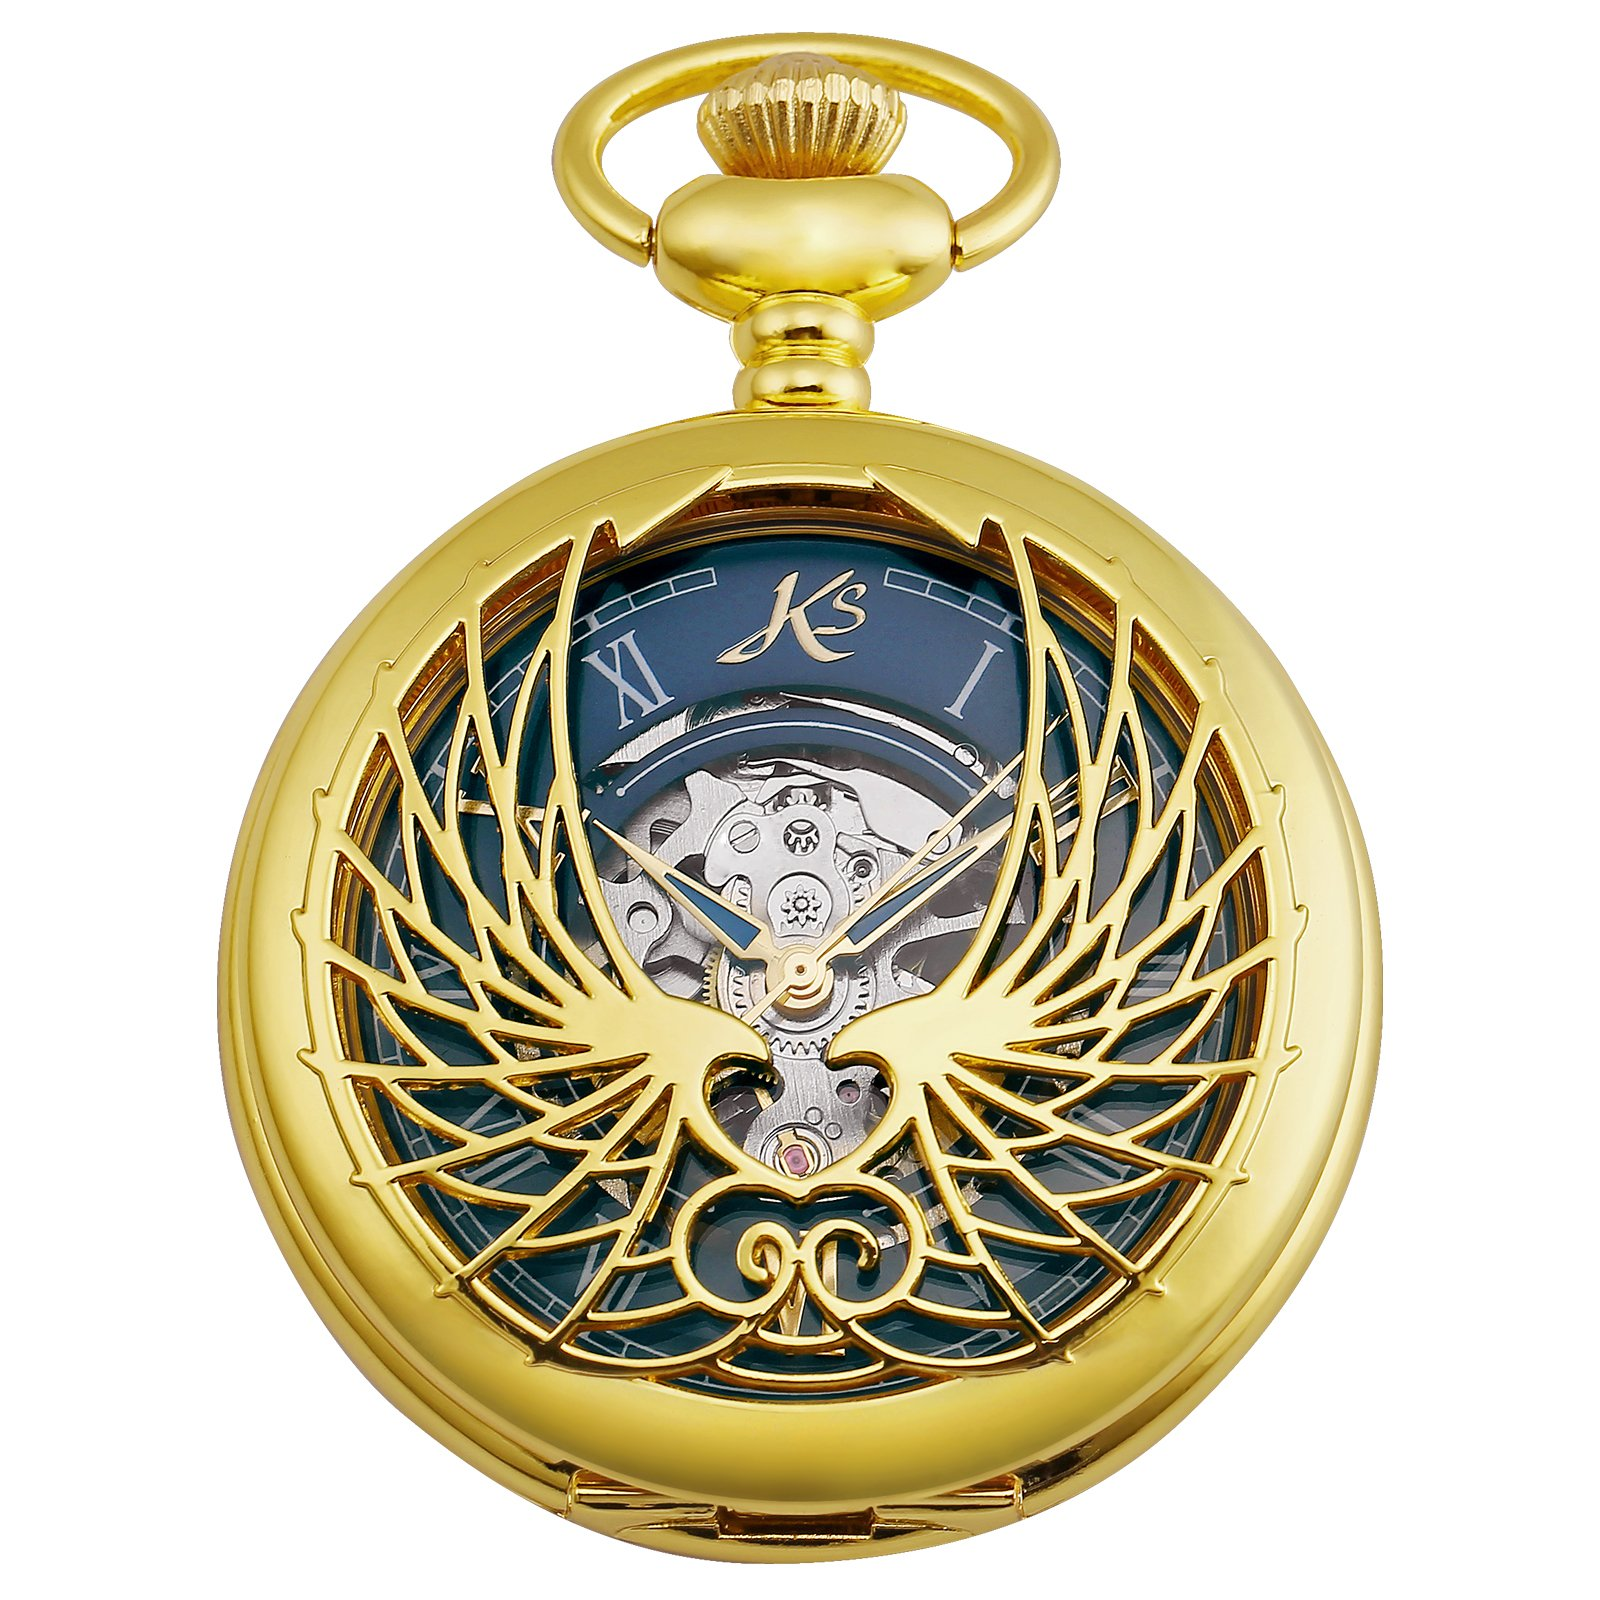 KS Skeleton Eagle Wings Design Case Roman Numeral Markers Mechanical Pocket Watch KSP121